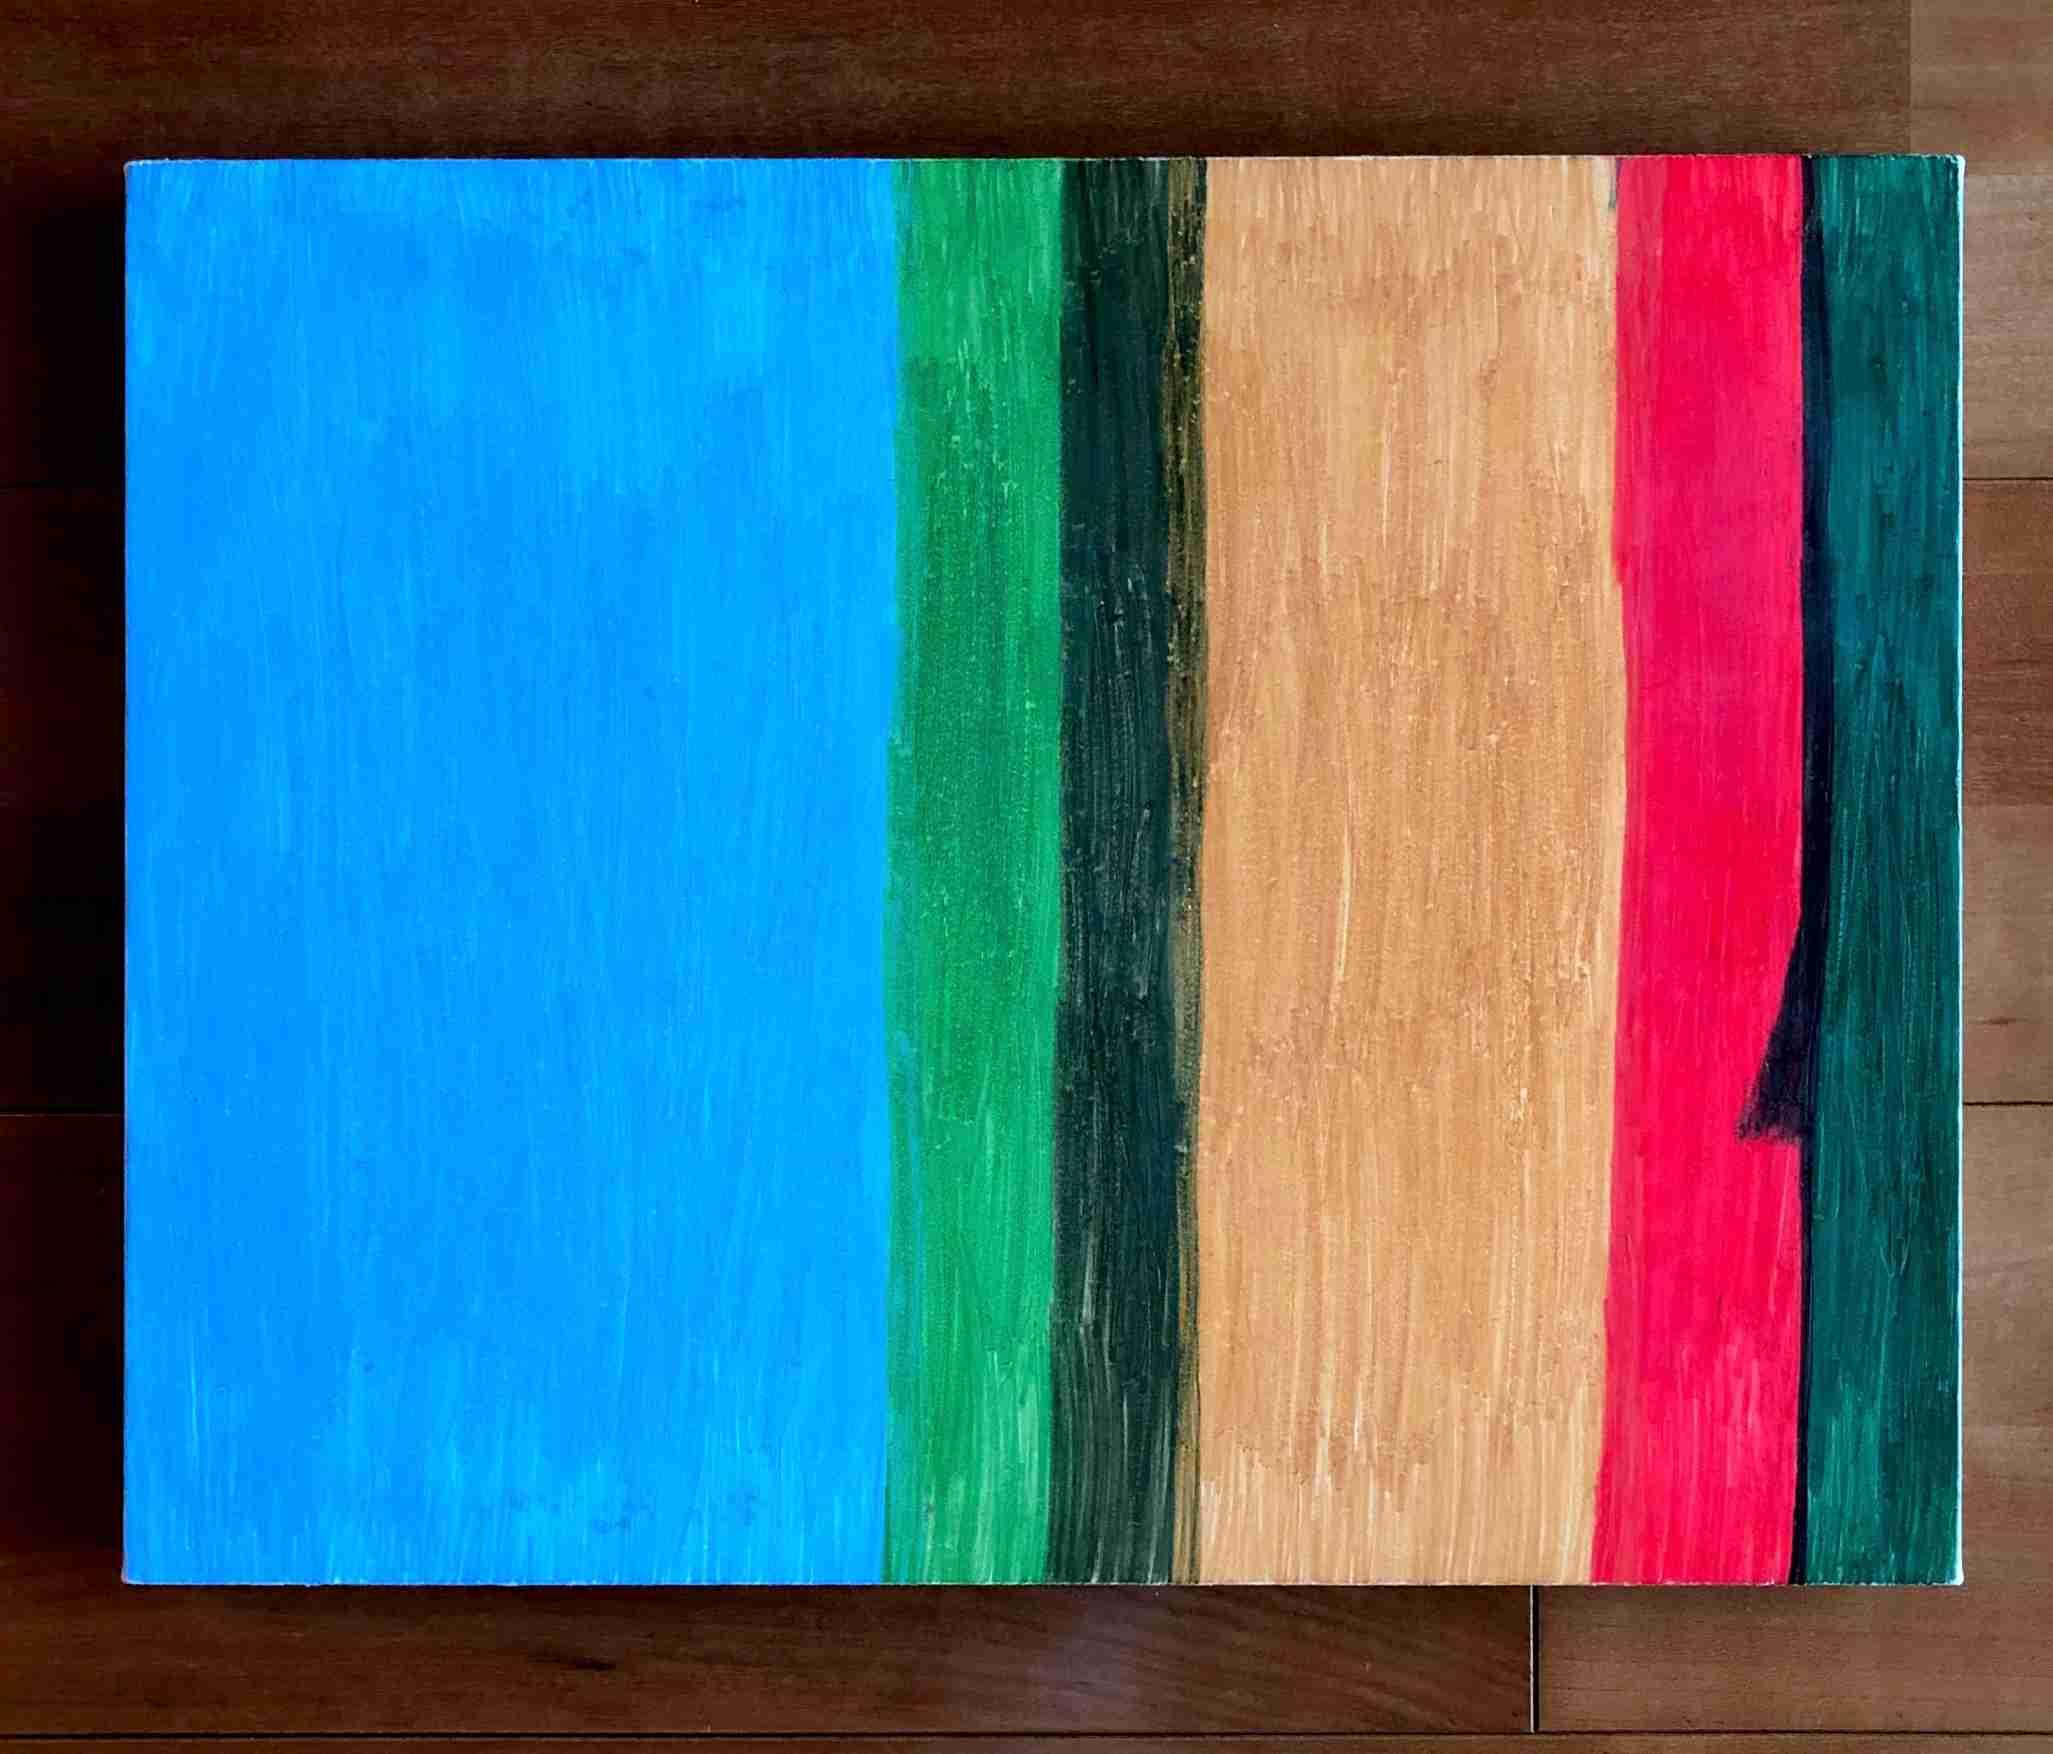 Light blue/Moss green/Olive green/Gold orker/ Scarlet/Sap green